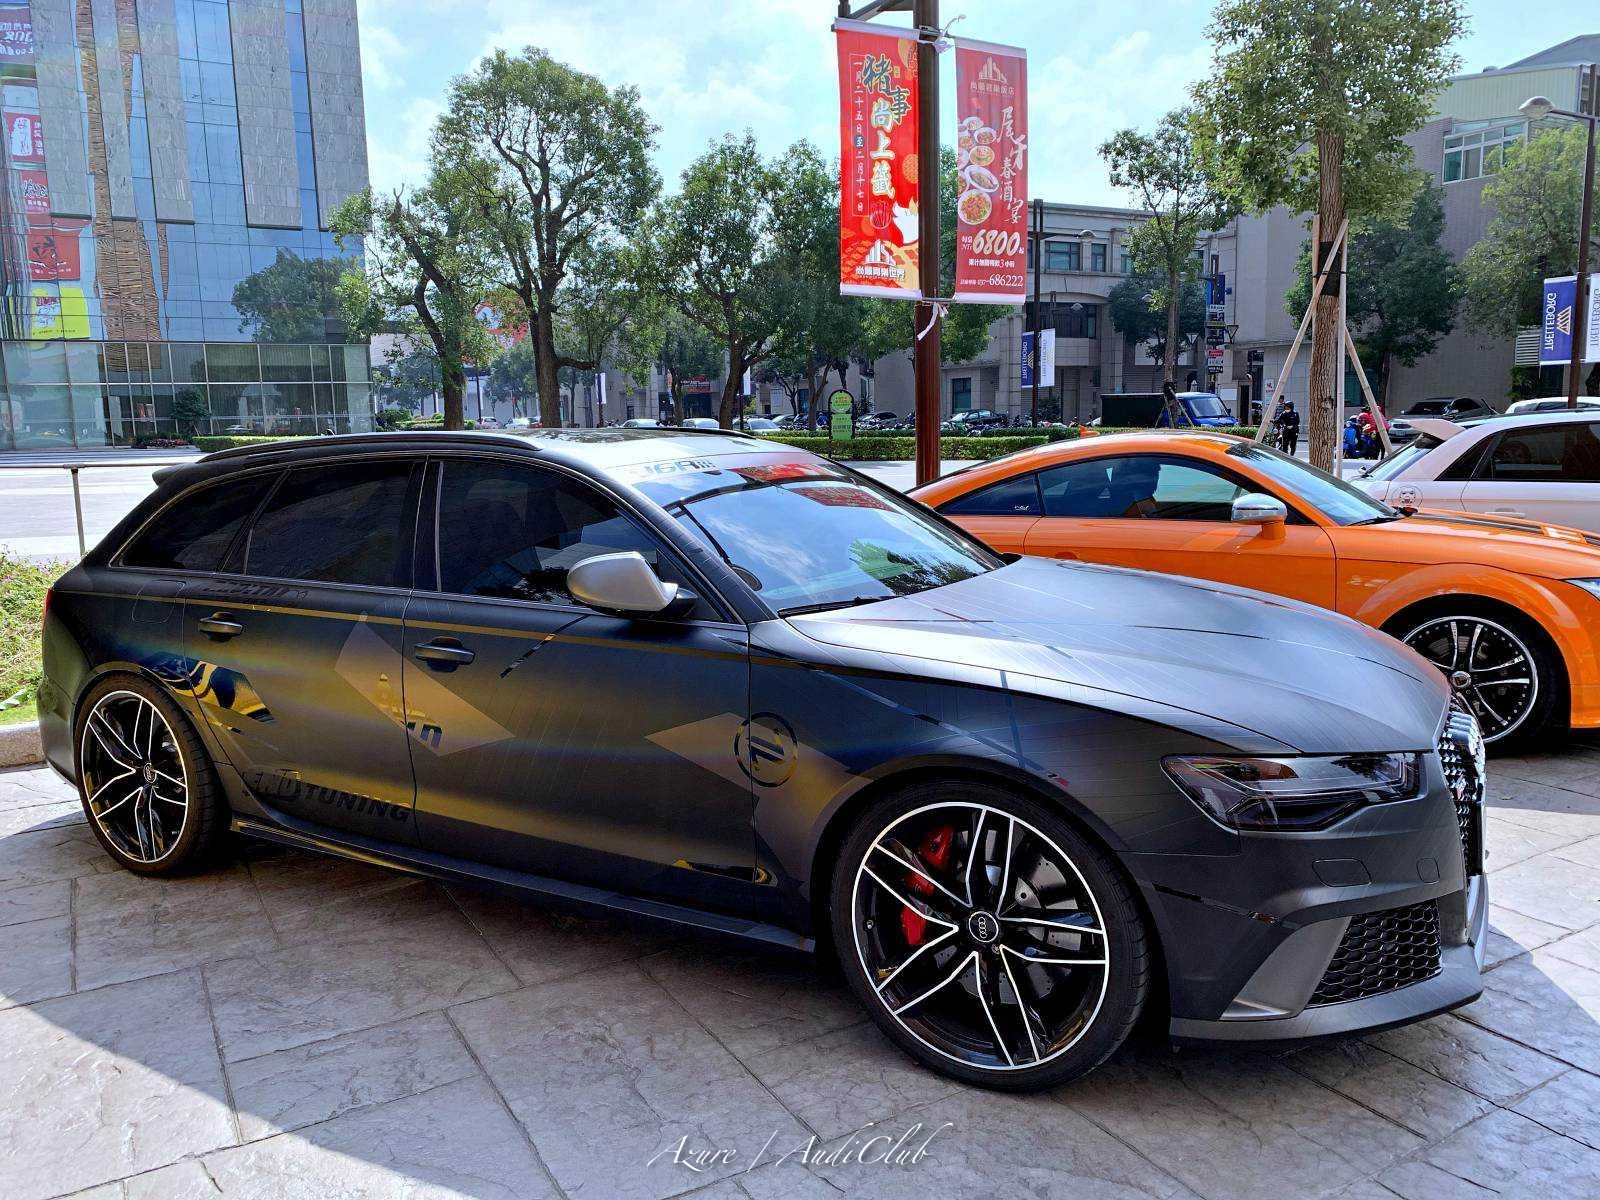 RS6-Audi-club全台奧迪車聚,超過兩百台奧迪齊聚苗栗尚順育樂中心